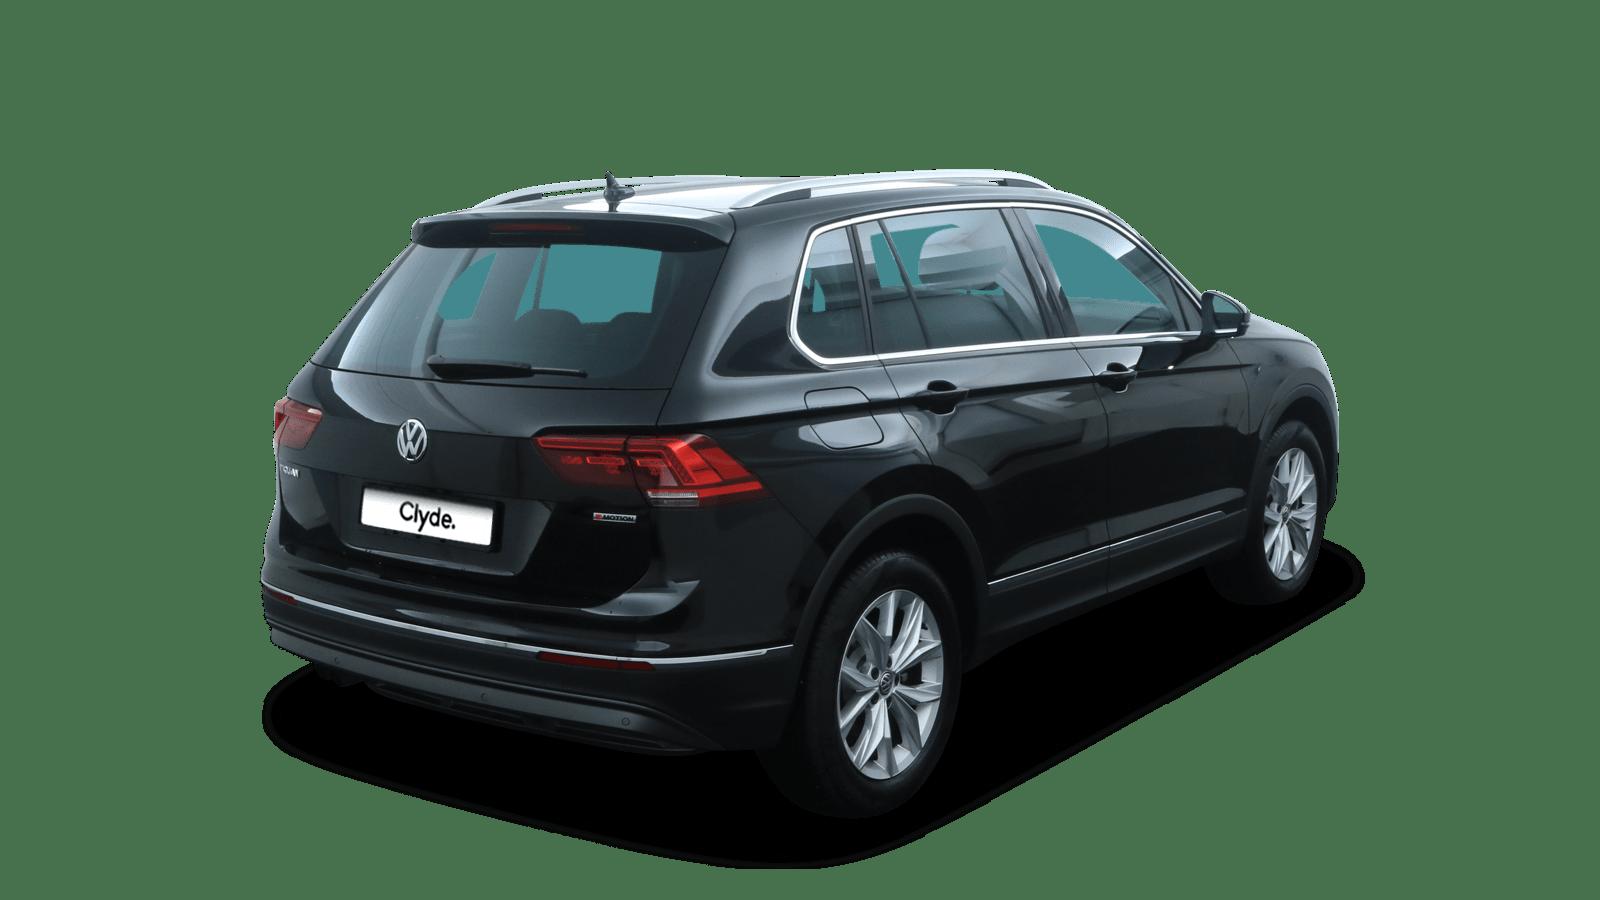 VW Tiguan Schwarz rückansicht - Clyde Auto-Abo